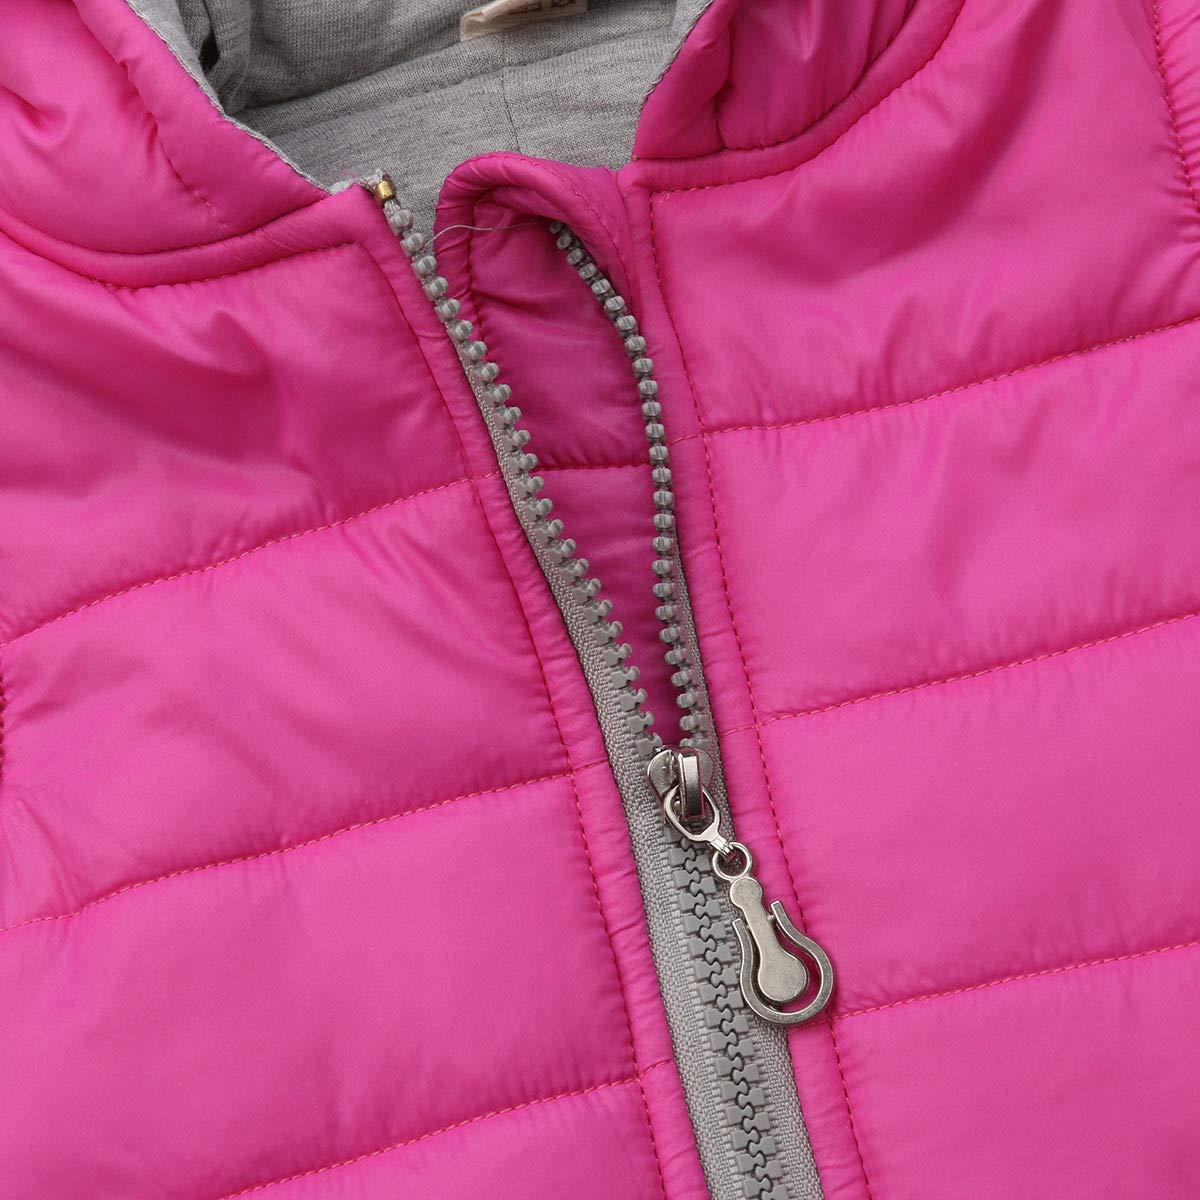 GuliriFei Toddler Baby Girl Boy Hoodies Vest Outwear 3D Dinosaur Waistcoat Warm Jacket Autumn Winter Clothes